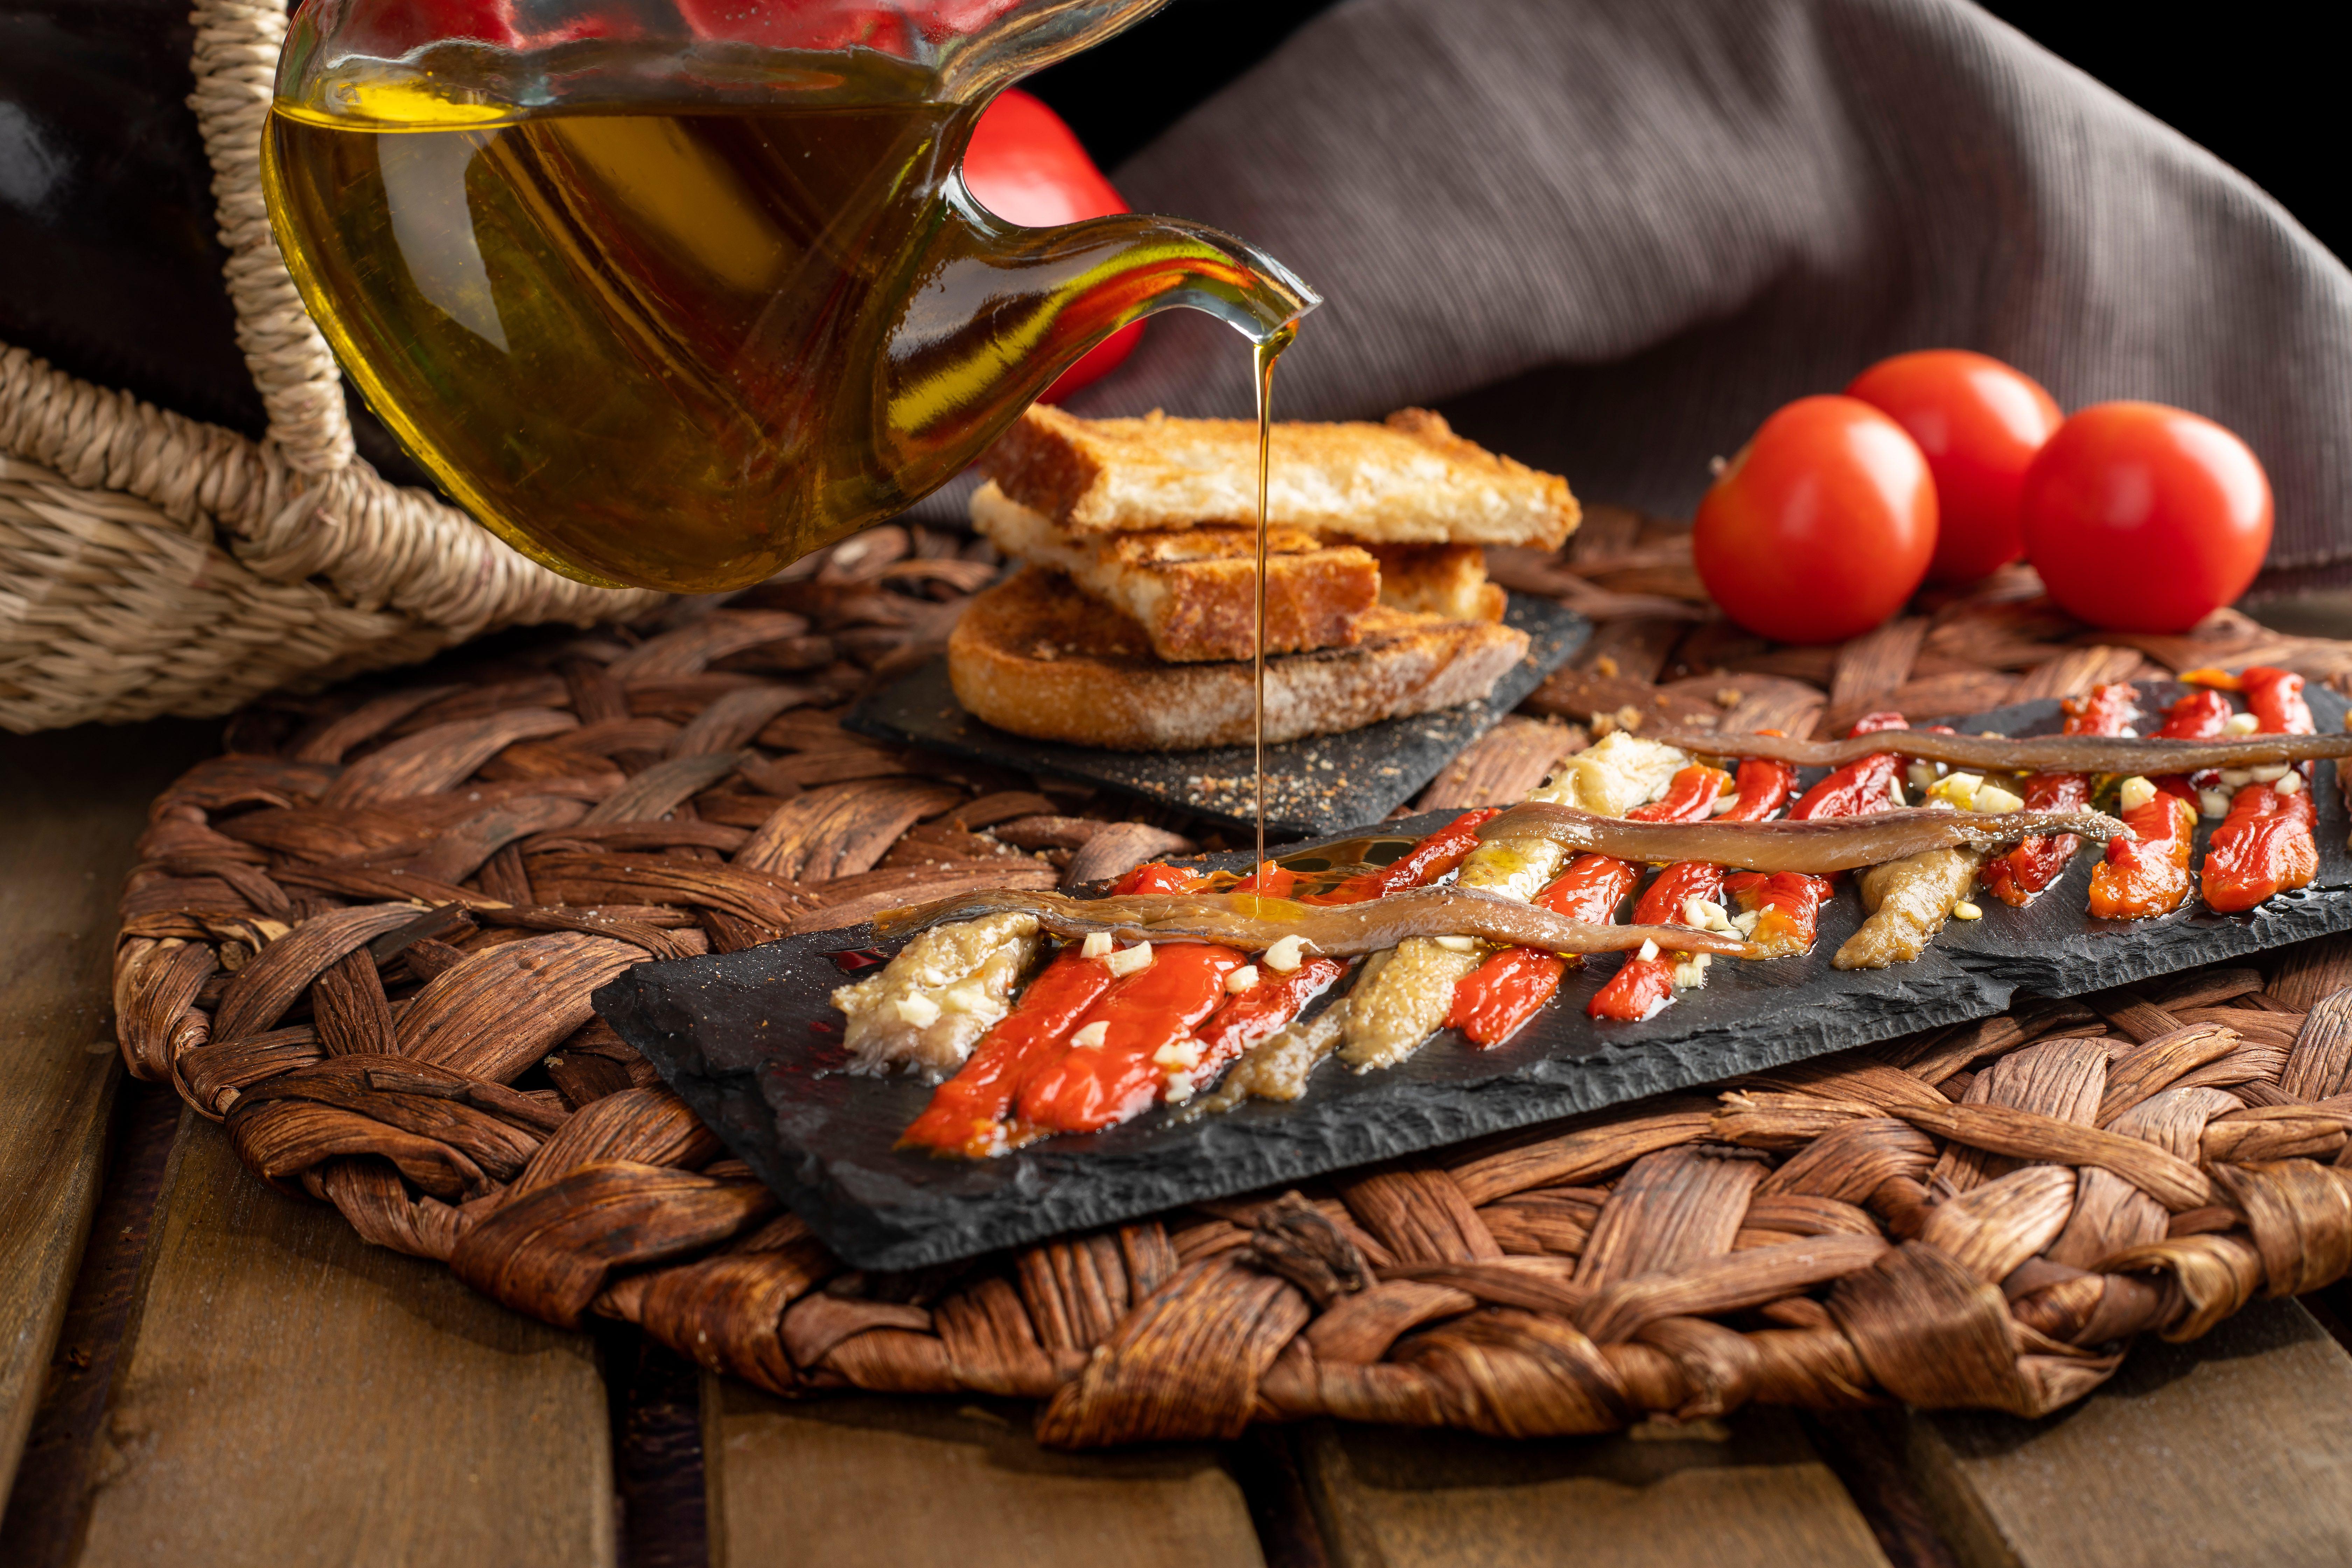 Cucina spagnola, i piatti tipici: escalivada